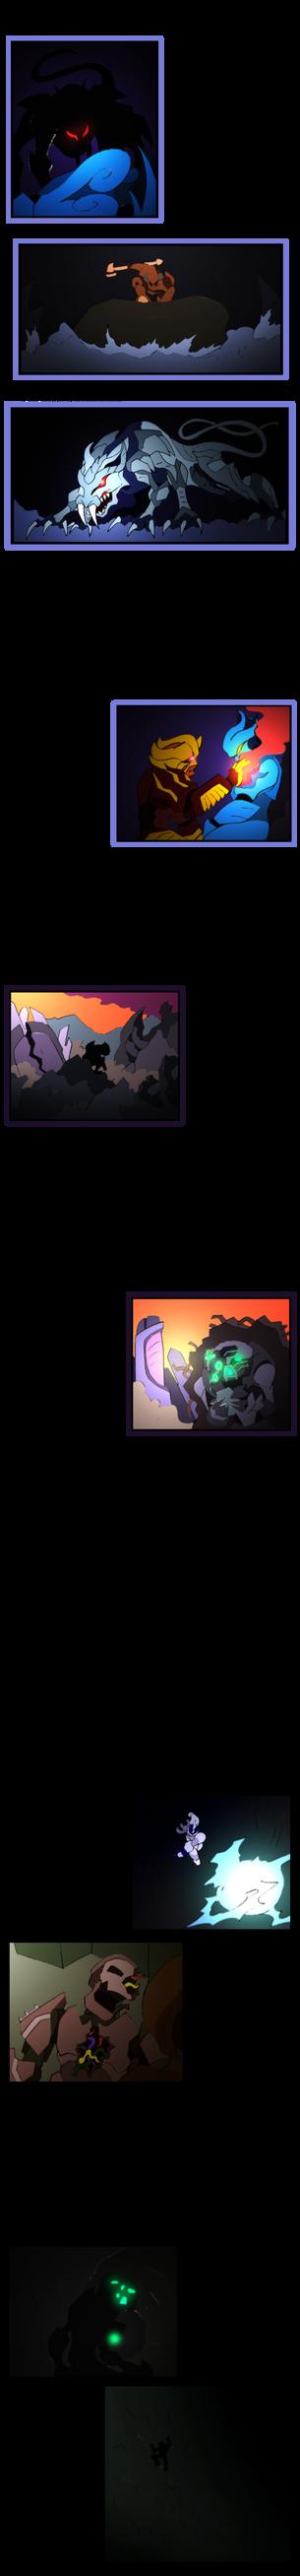 Bionicle- Nova Orbis- Mystery- Chapter 19